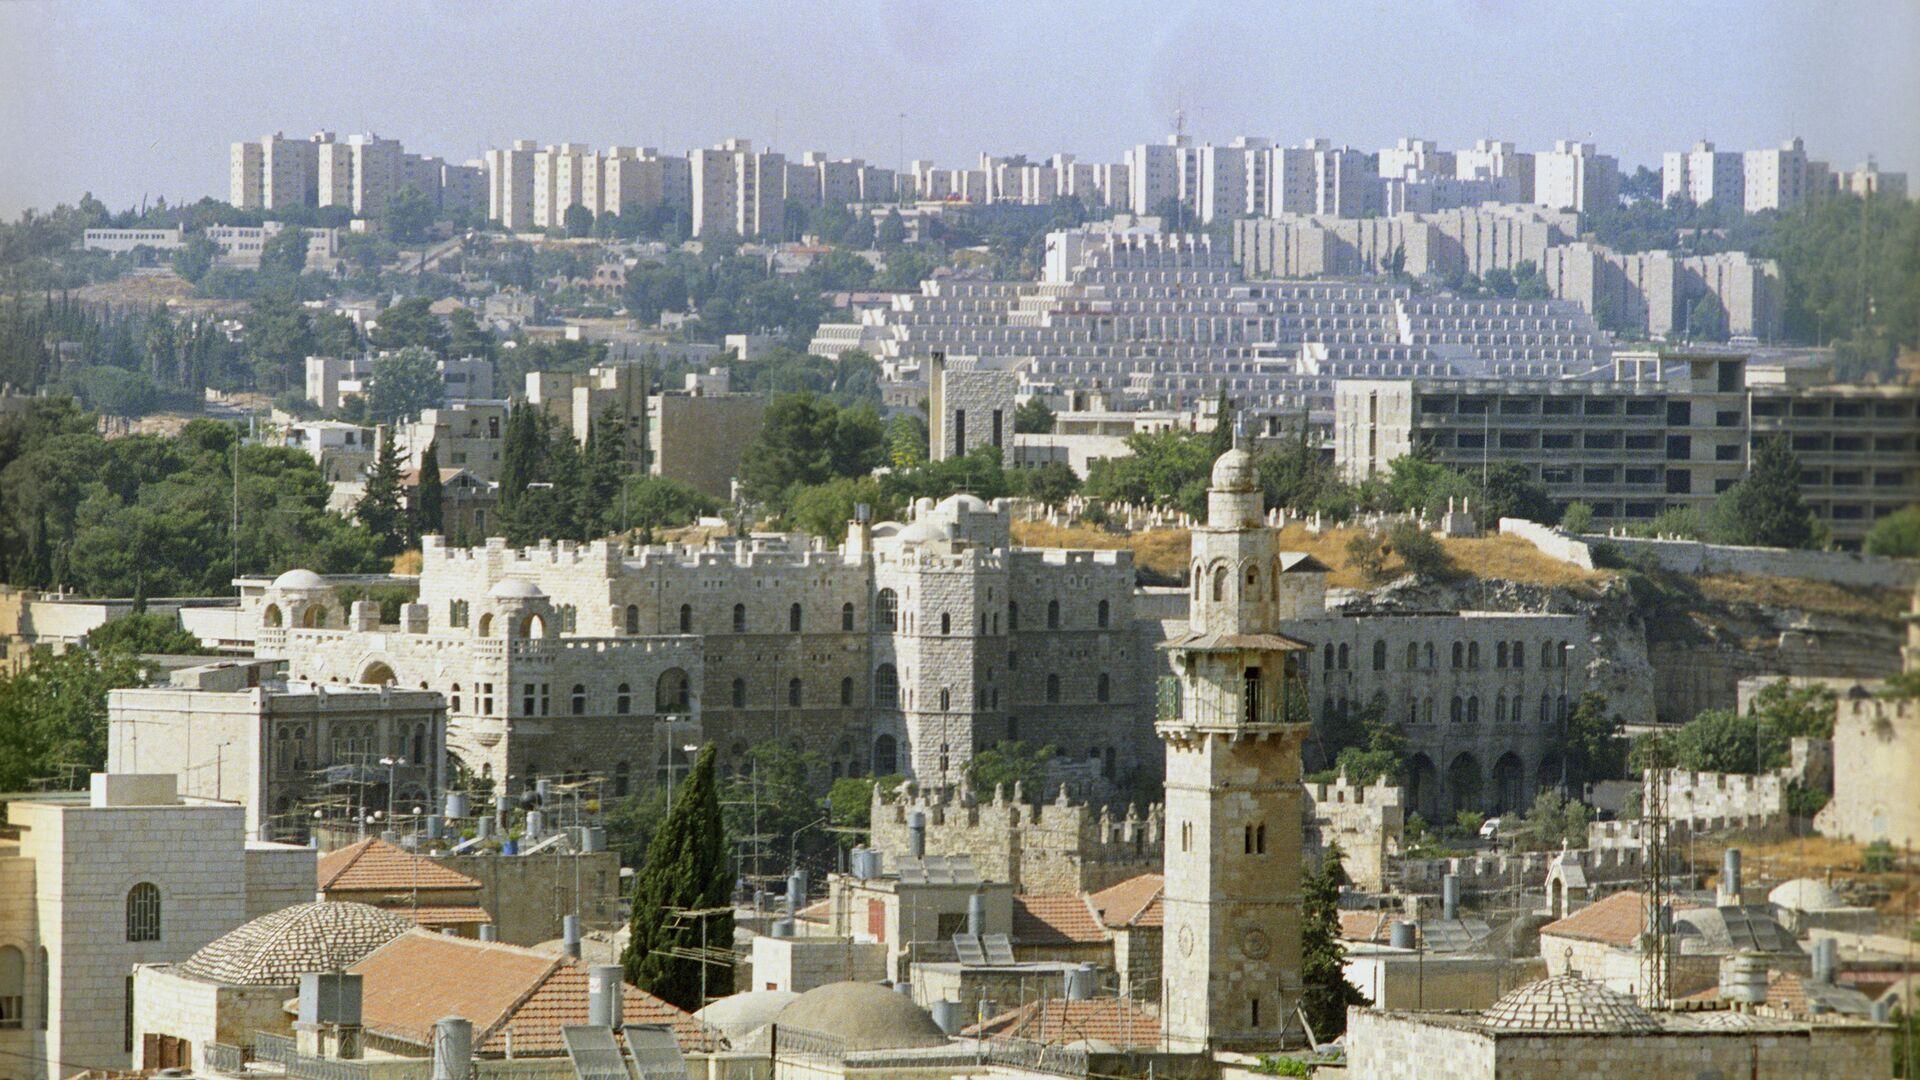 Панорама Иерусалима. Архивное фото - Sputnik Azərbaycan, 1920, 13.10.2021